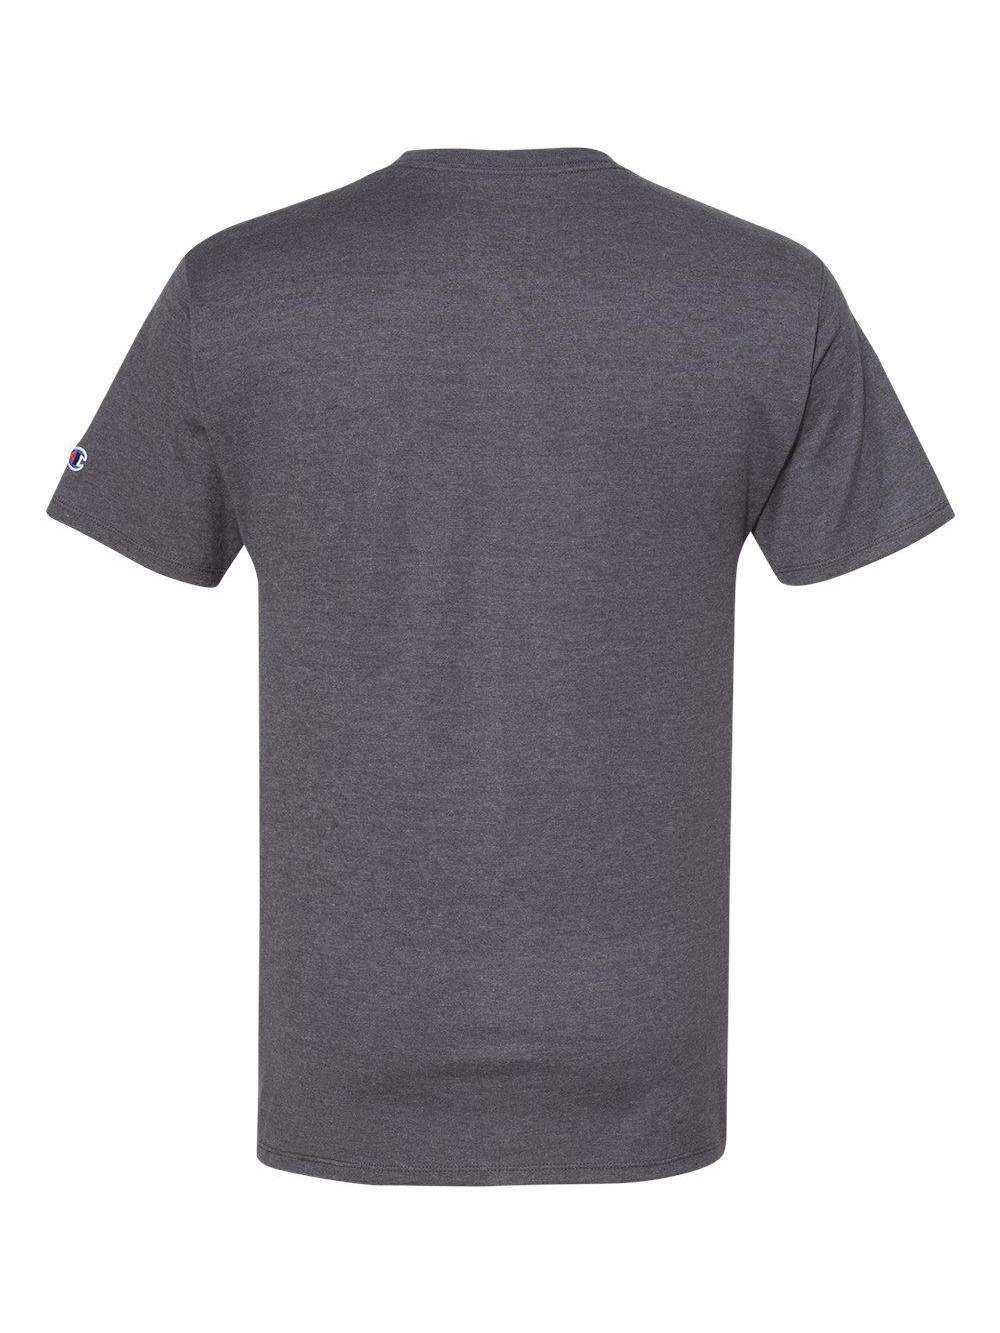 Champion-Premium-Classics-Short-Sleeve-T-Shirt-CP10 thumbnail 15